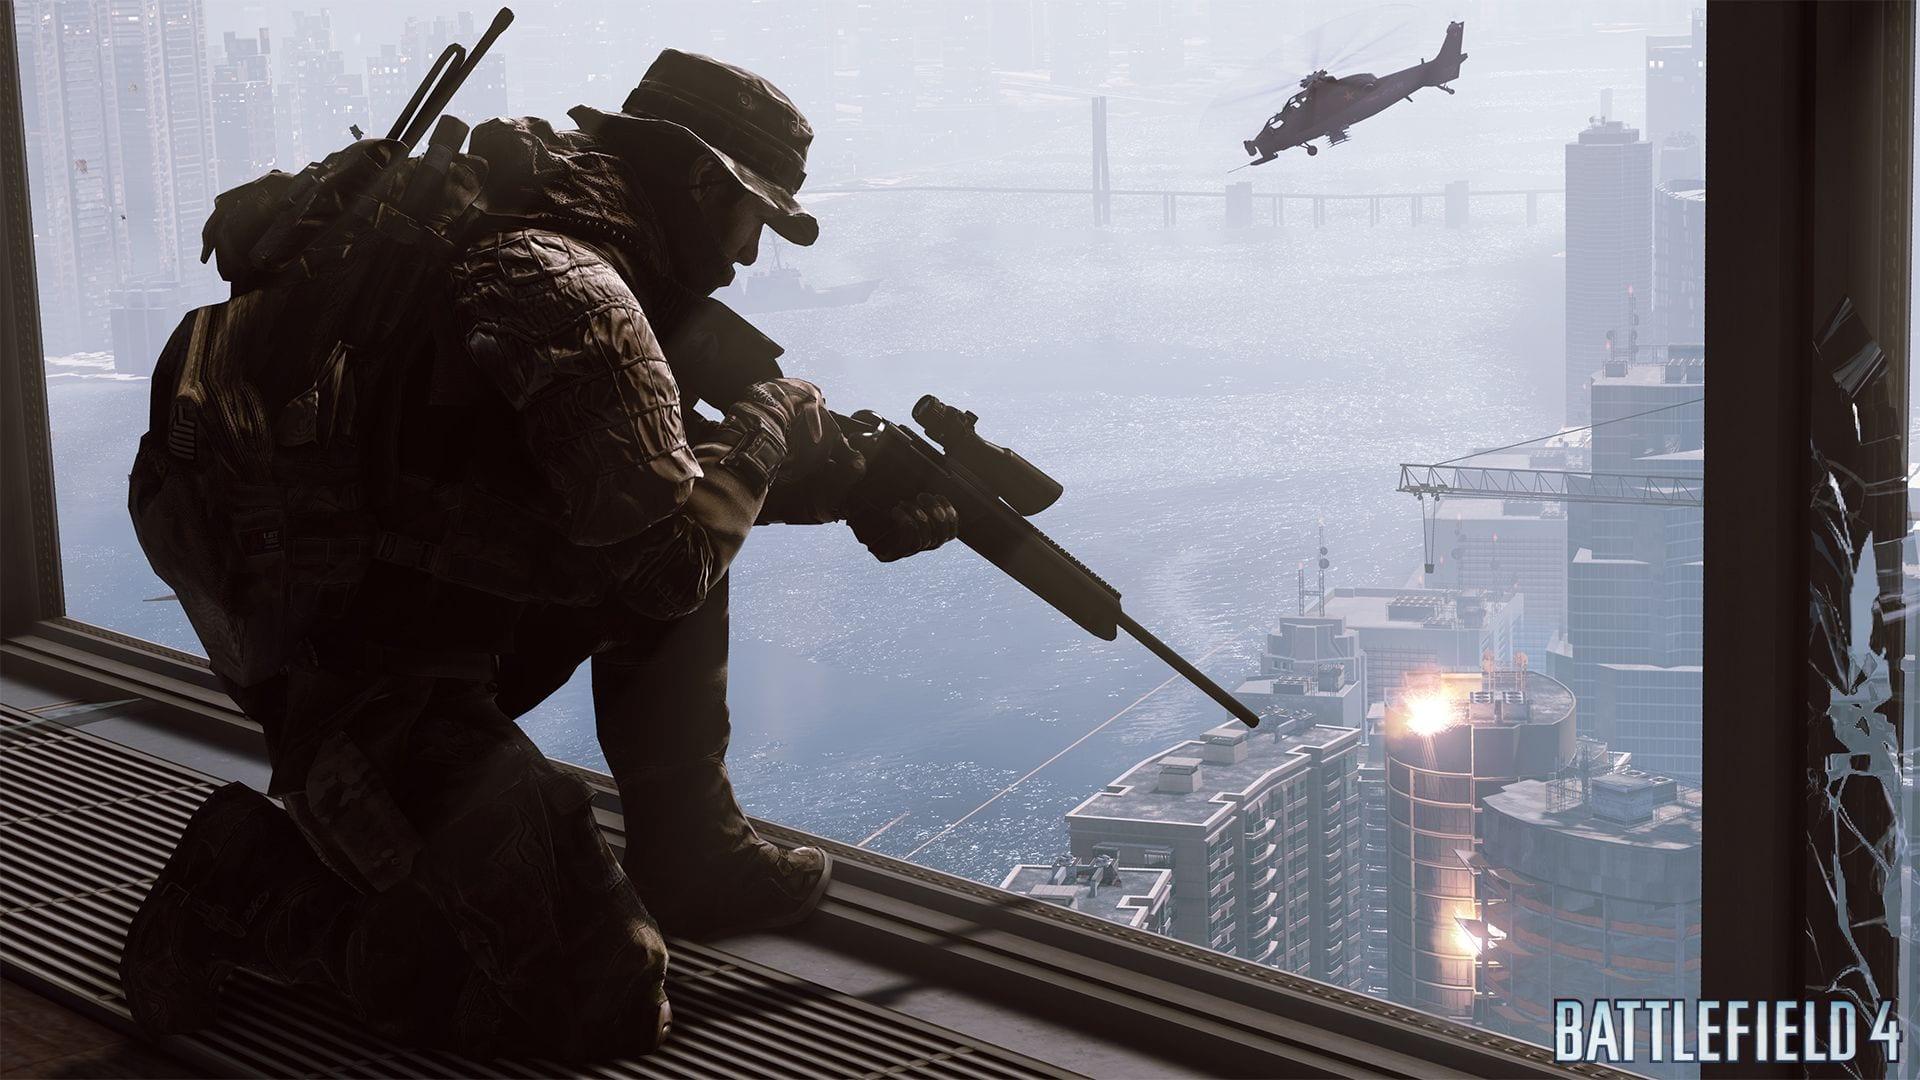 Battlefield-4-Gets-Multiplayer-Details-Gameplay-Video-Screenshots-3